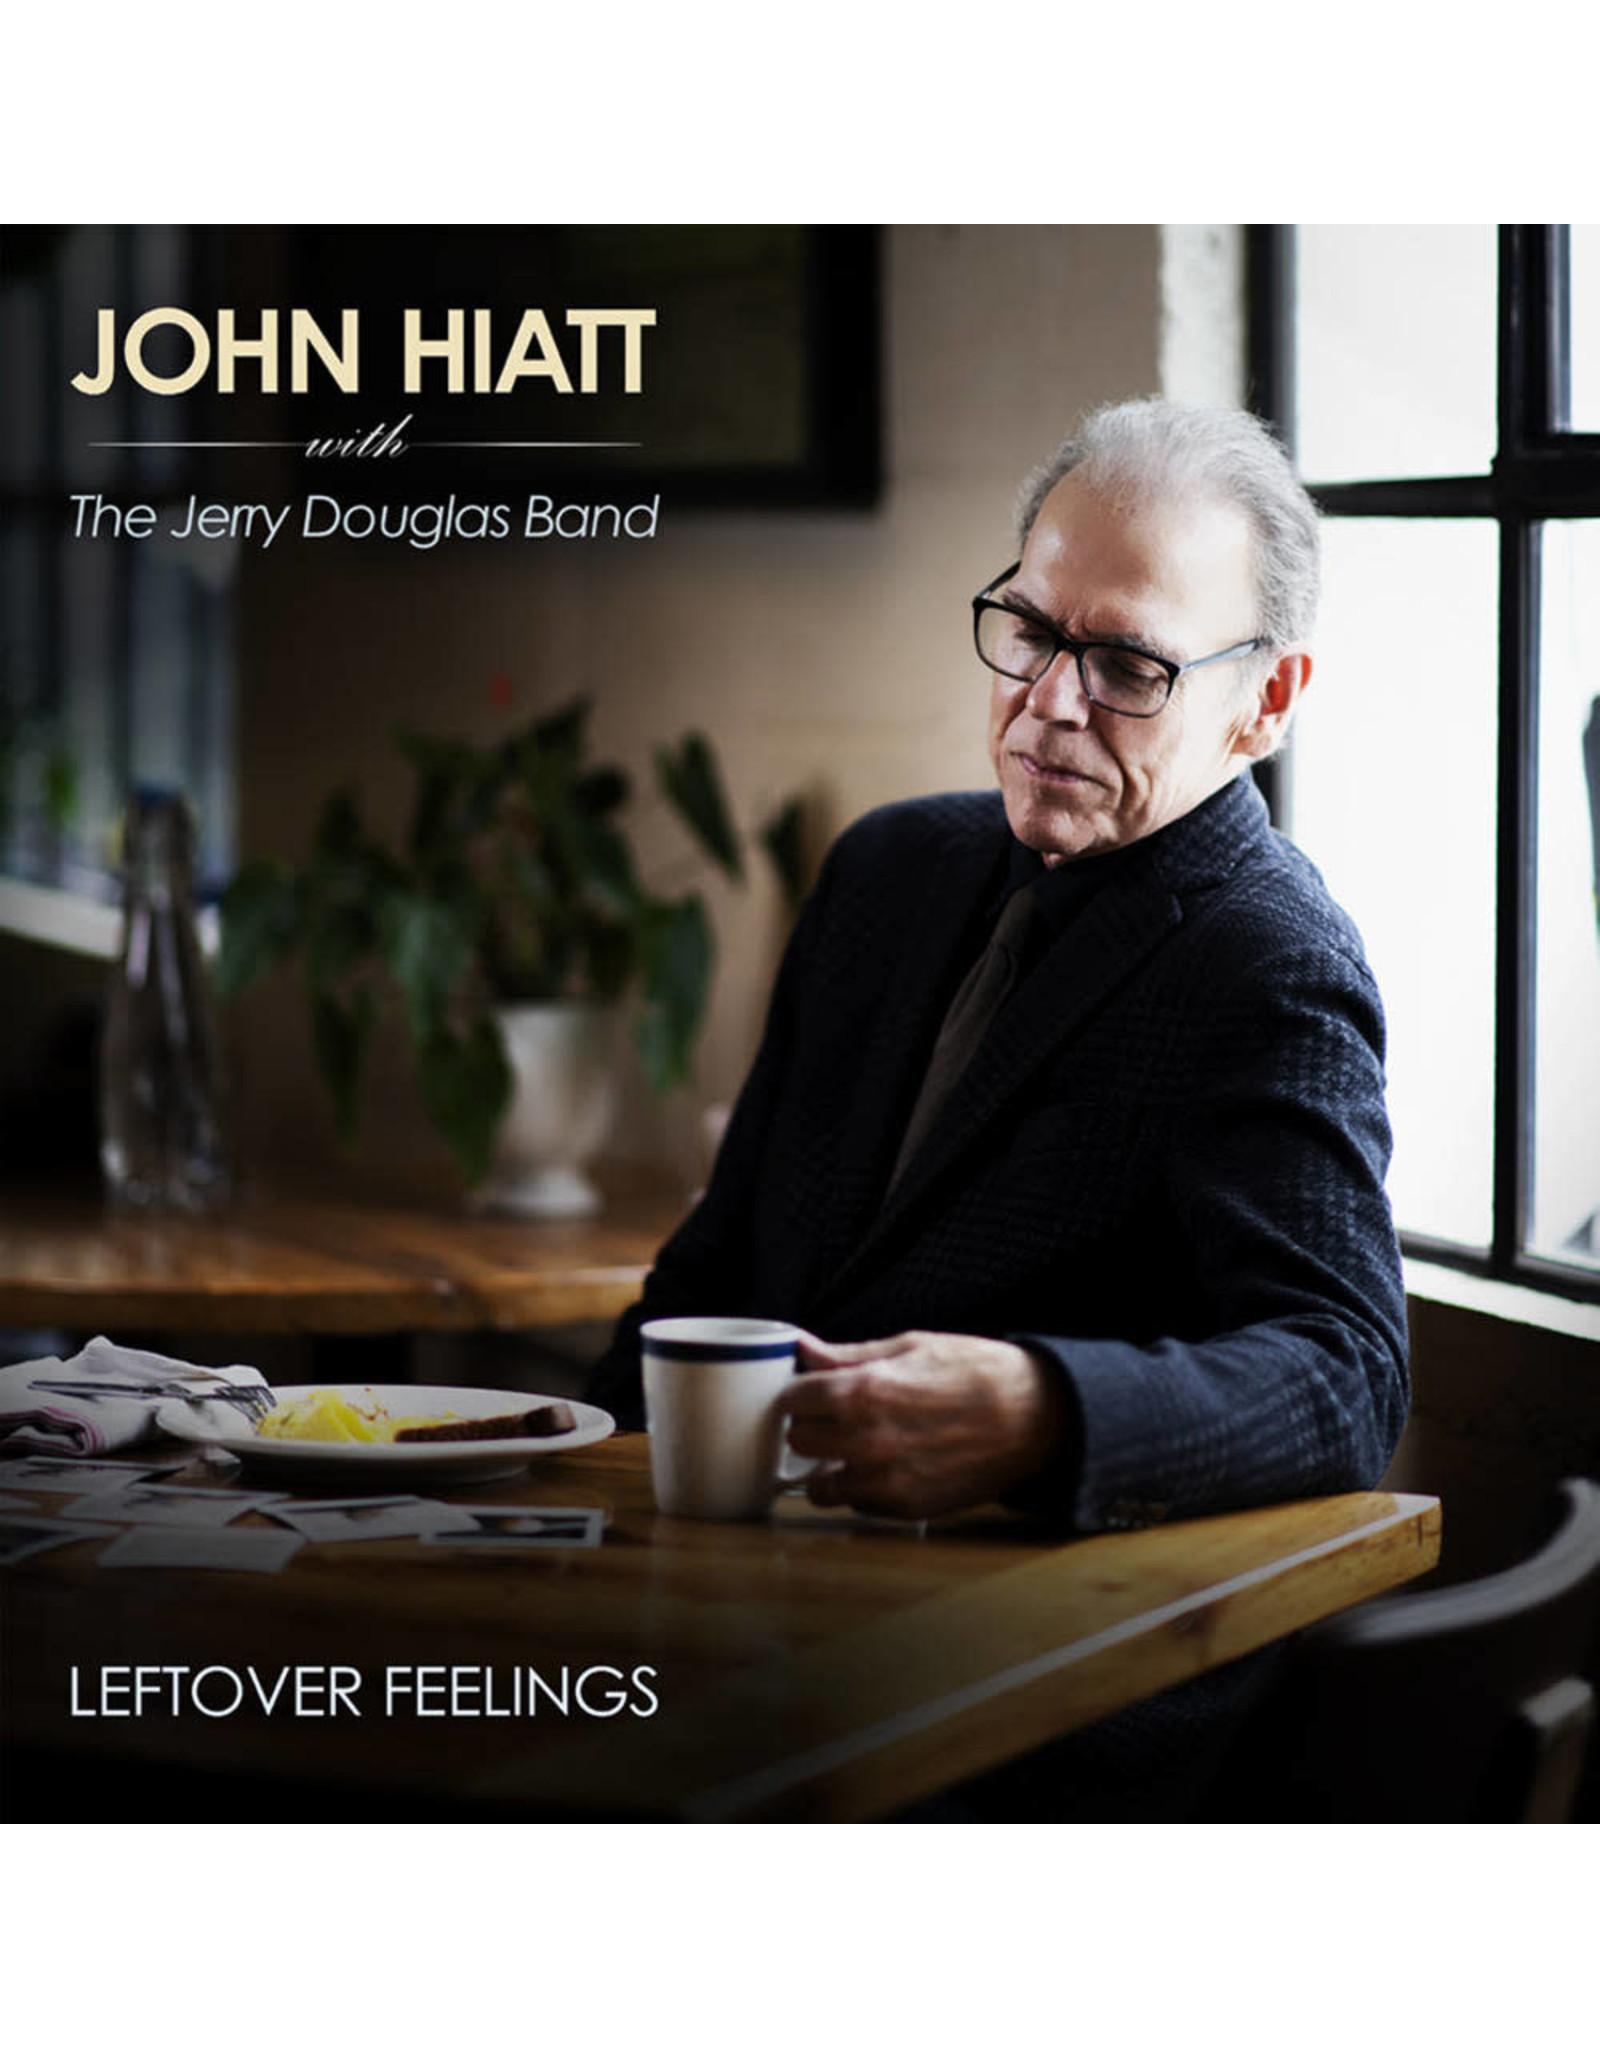 Hiatt, John with The Jerry Douglas Band - Leftover Feelings LP (Indie Colour Vinyl)